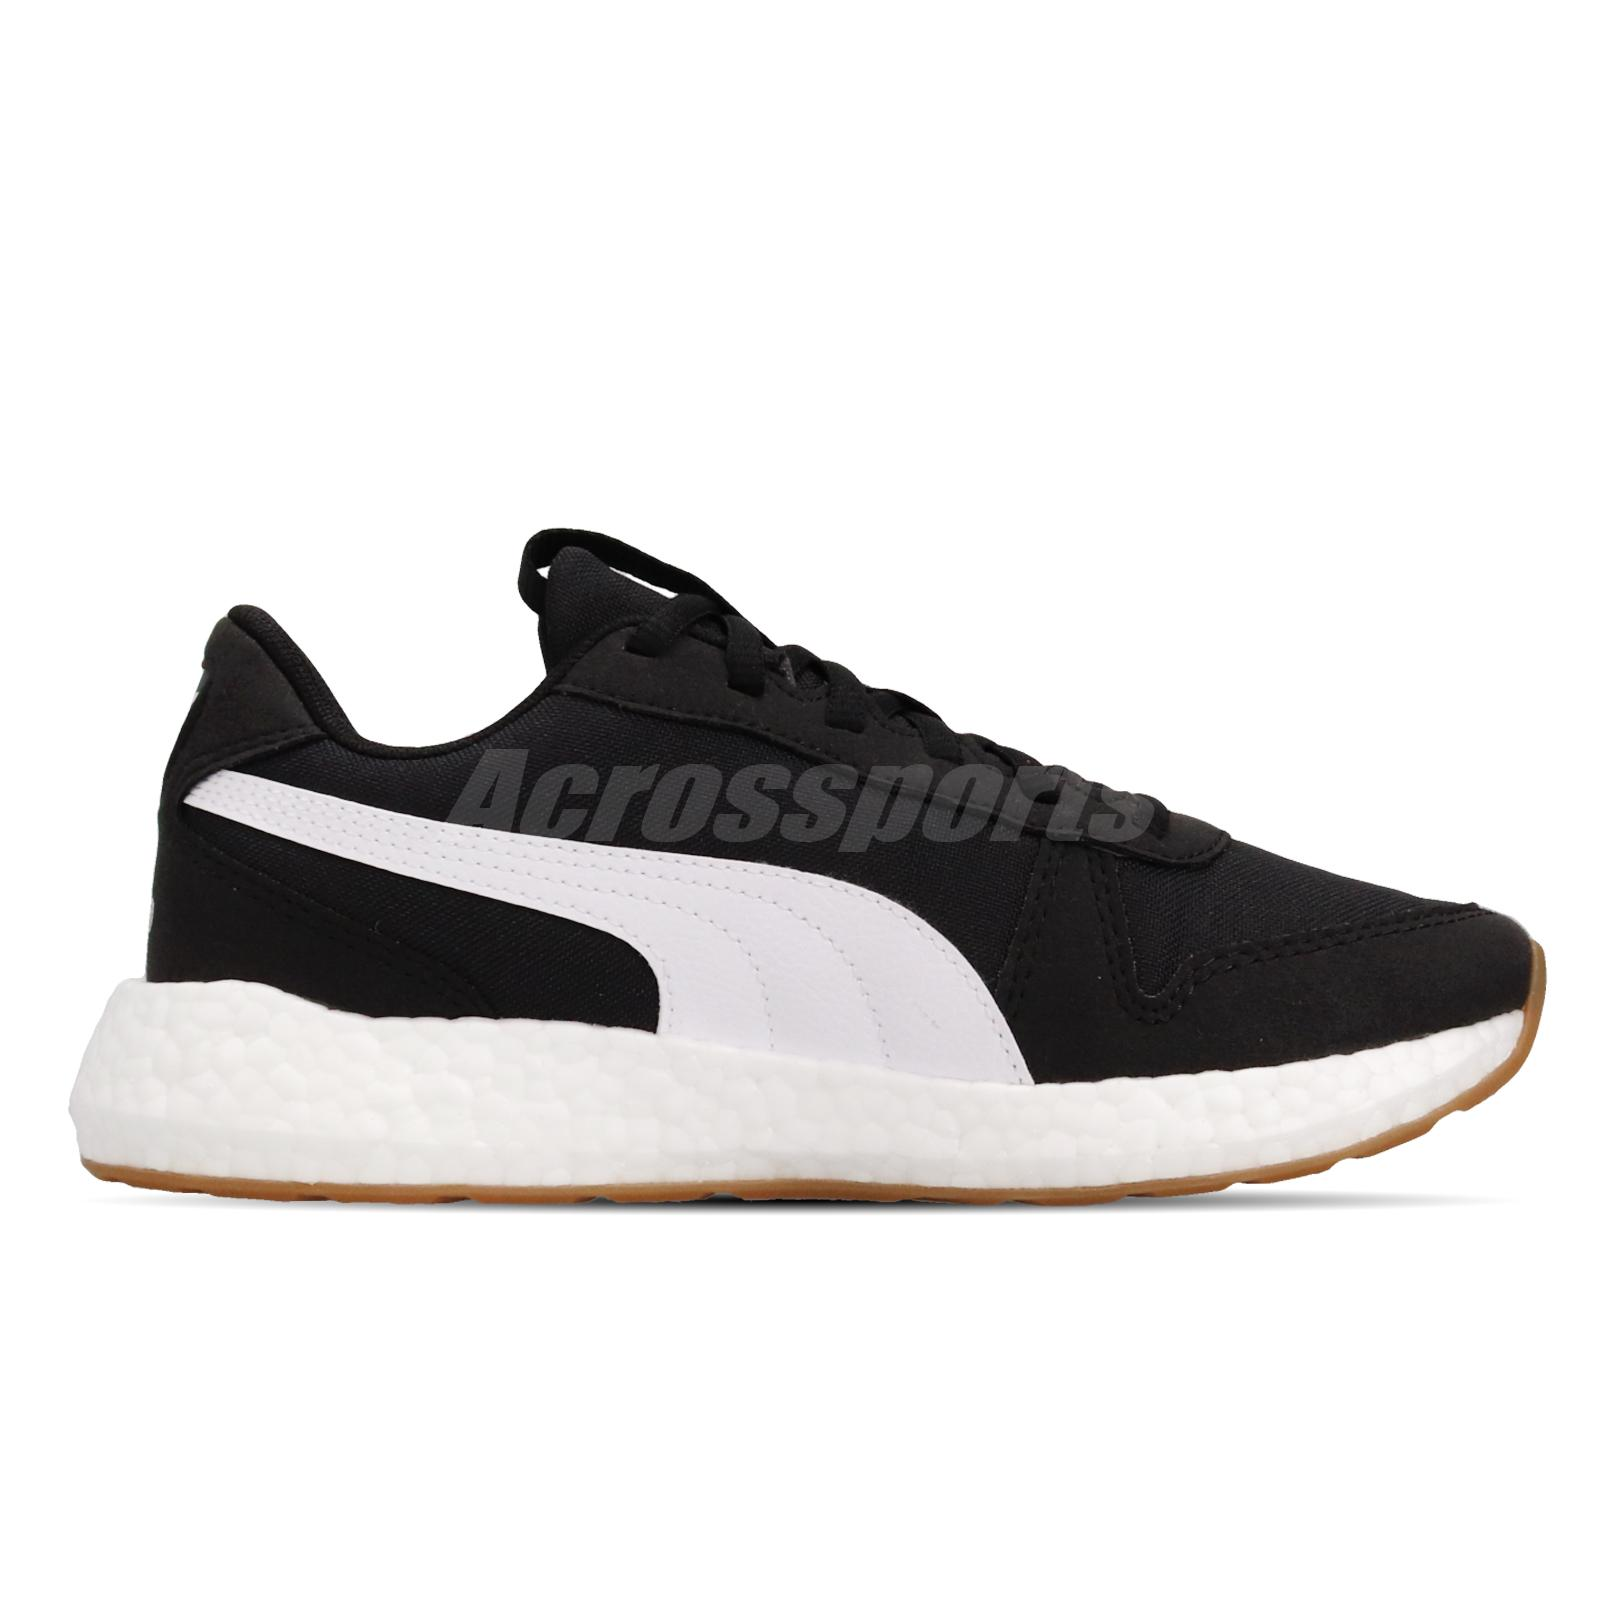 Details about Puma NRGY Neko Retro Wns Black White Gum Women Running Shoes  Sneakers 192617-02